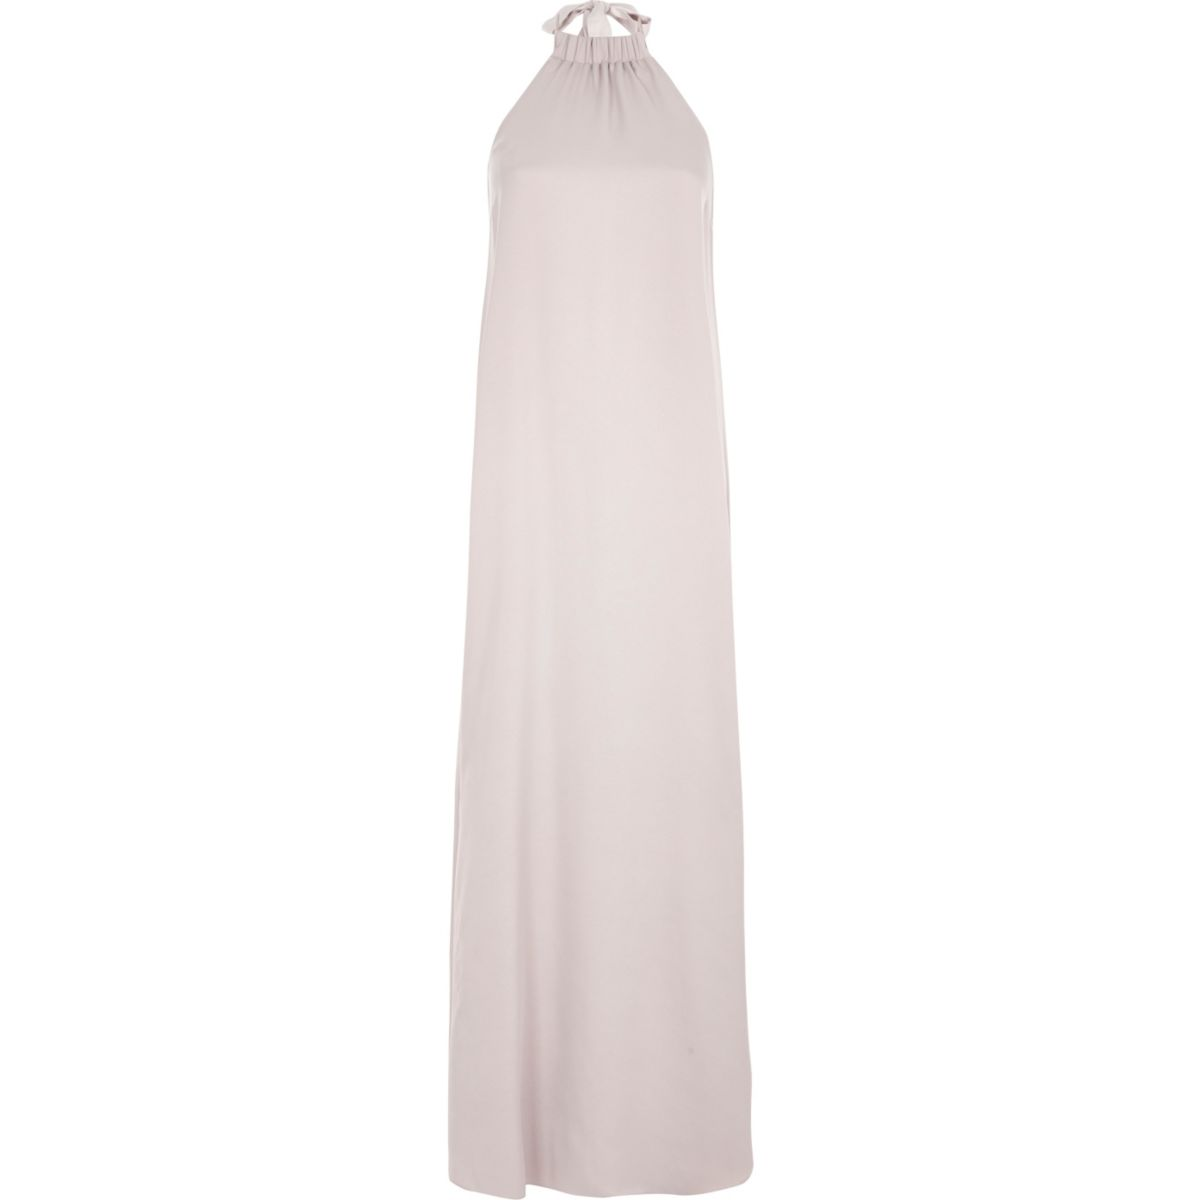 Grey silky halter neck maxi dress